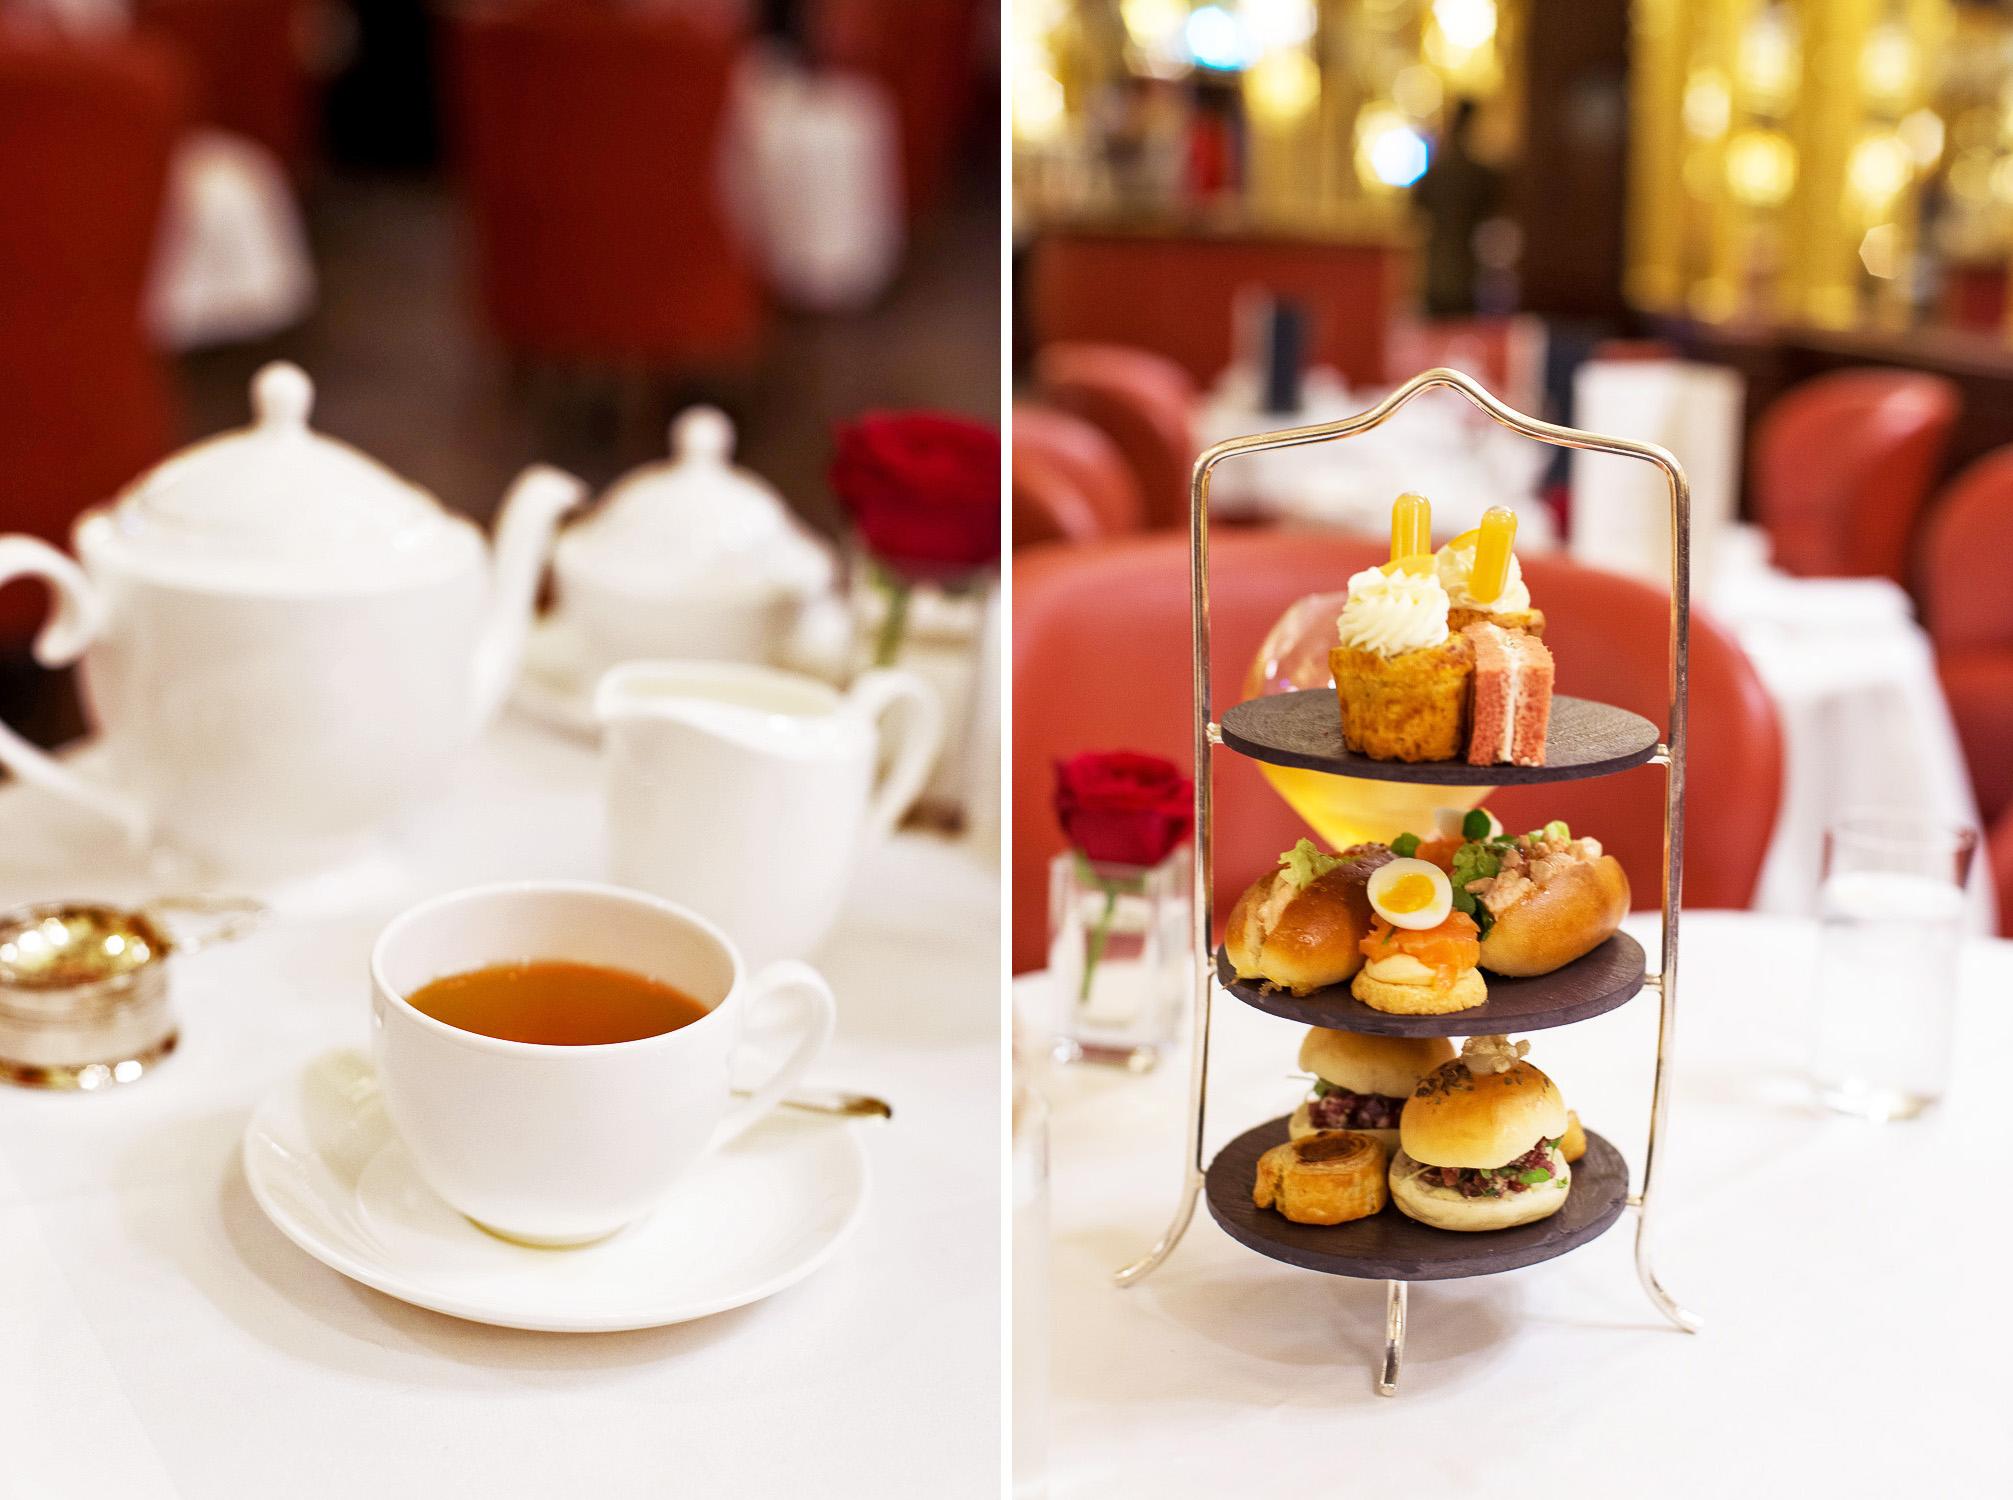 Afternoon-Tea-Hotel-Cafe-Royal-London-3 copy